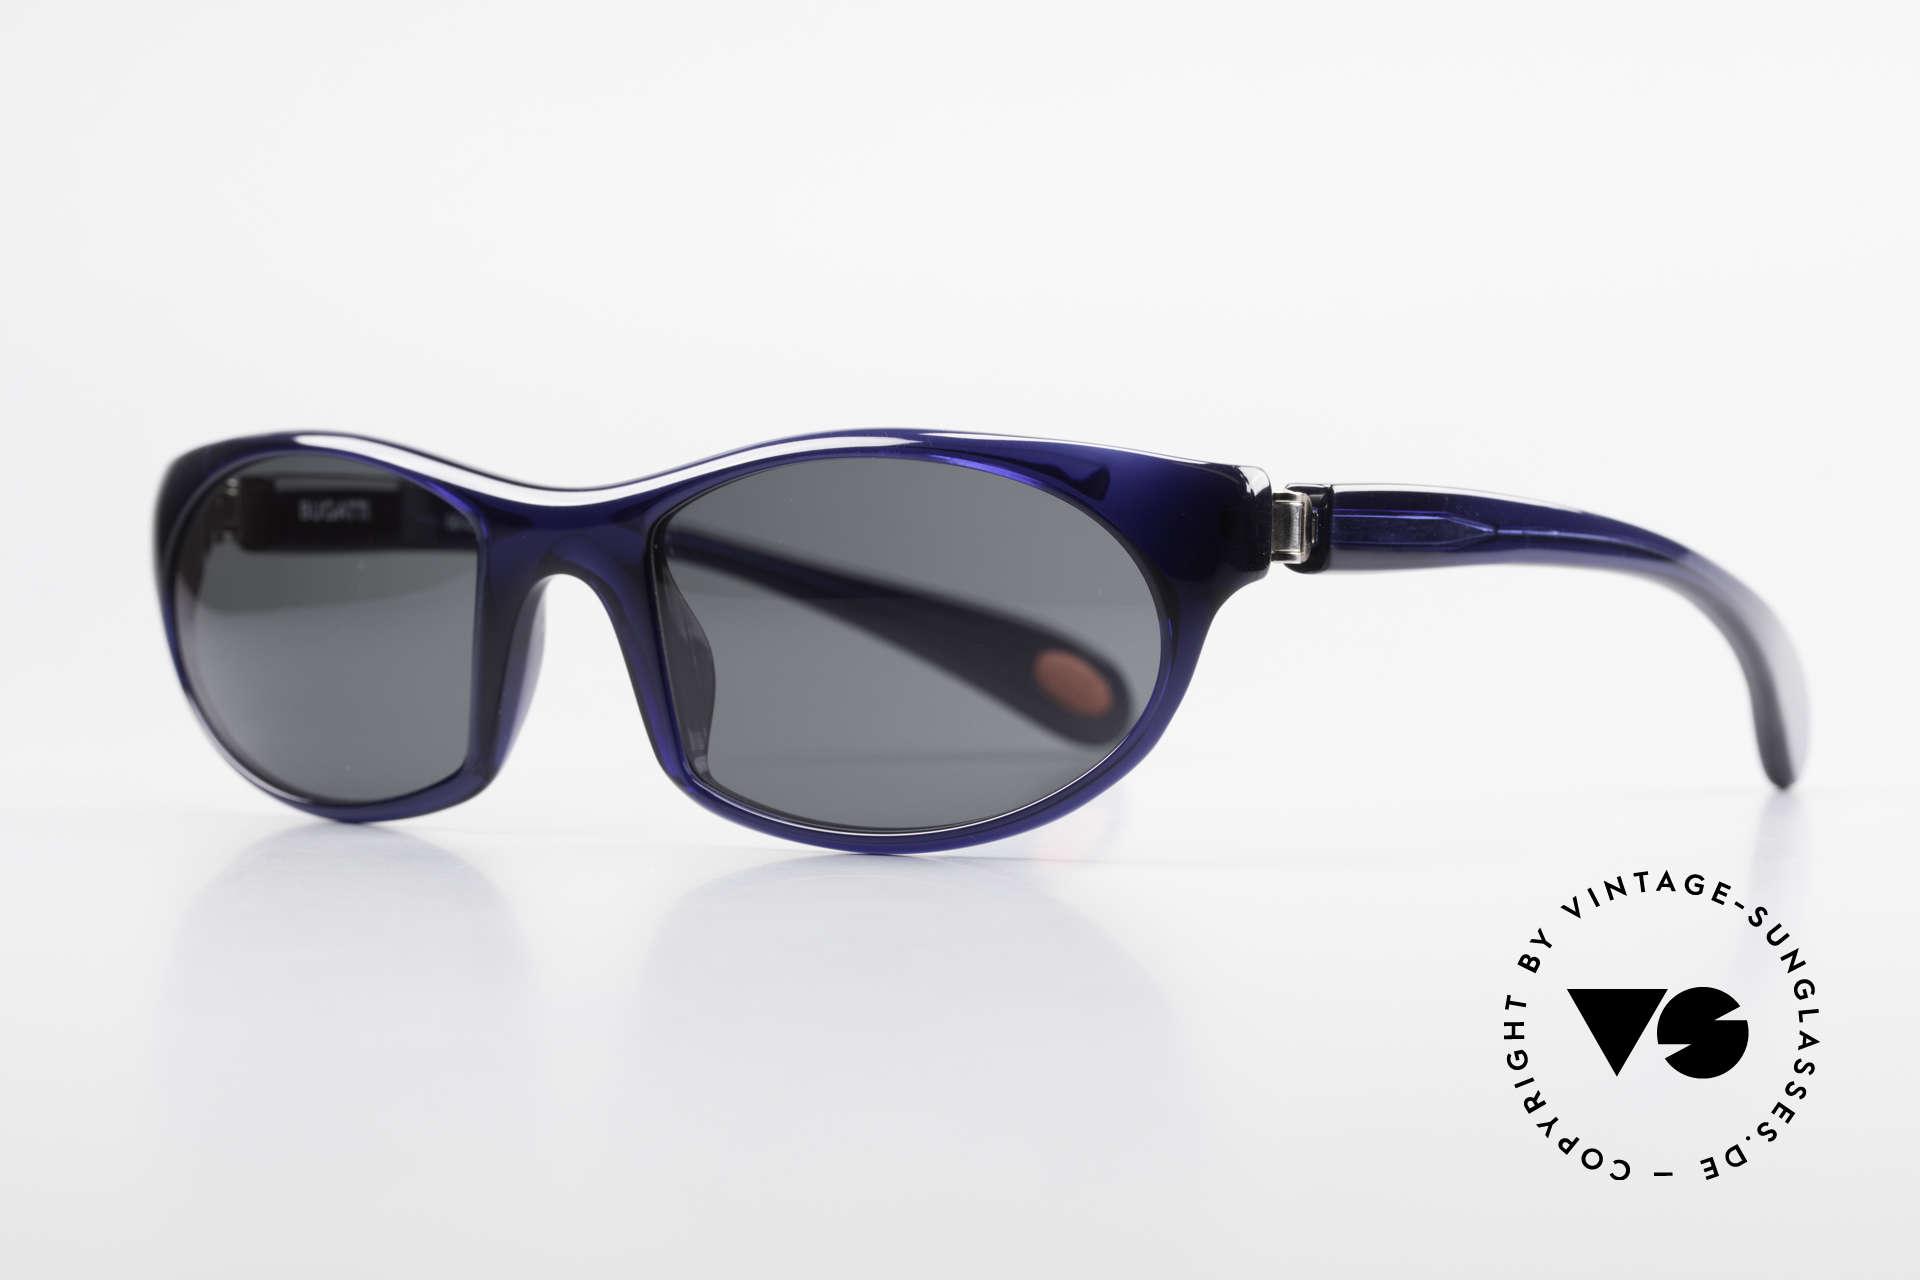 Bugatti 328 Odotype Men's Rare Designer Sunglasses, ergonomic frame with 180°-spring hinges!, Made for Men